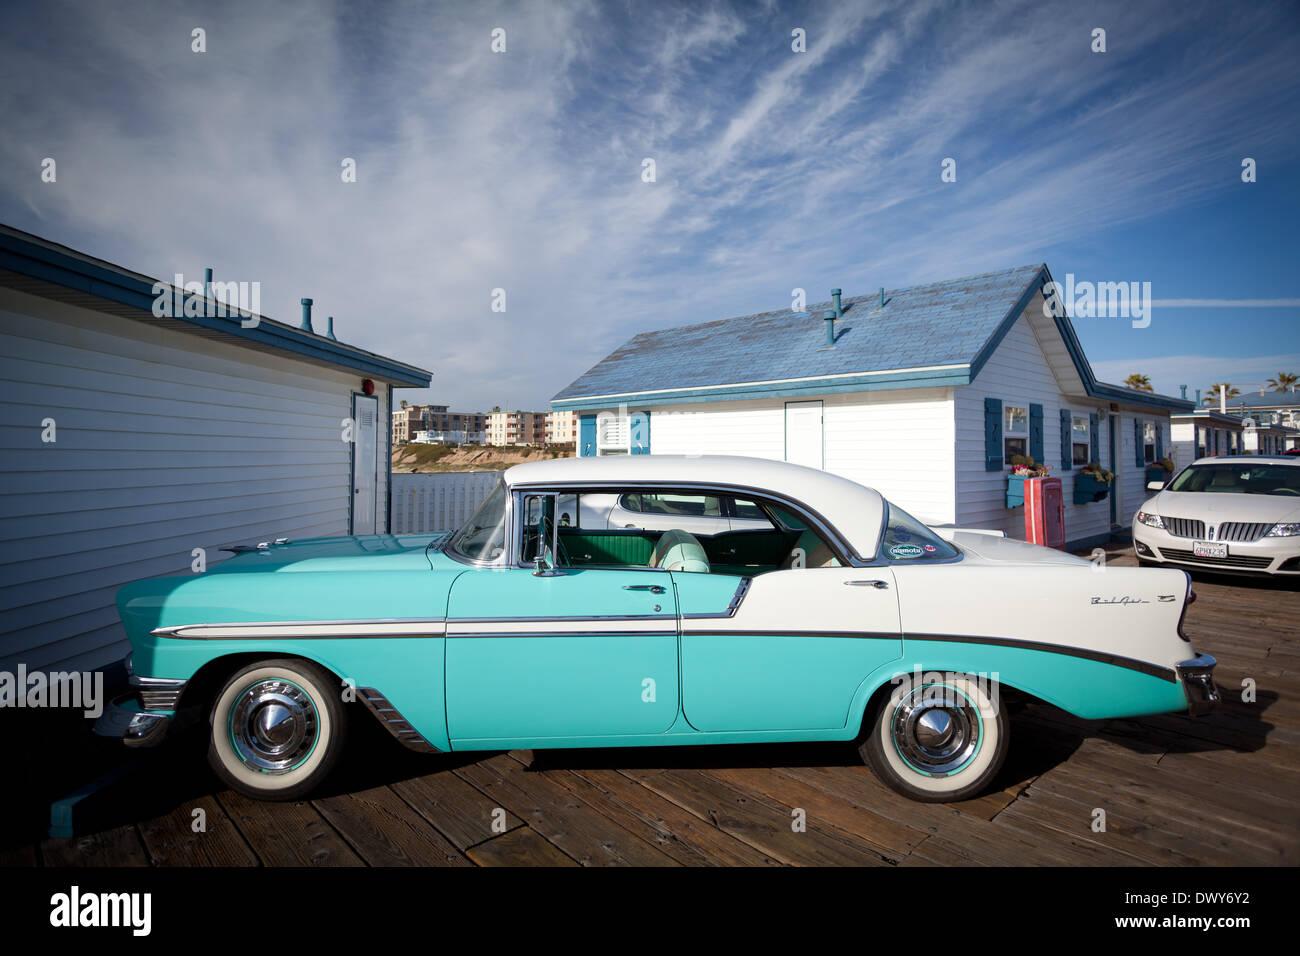 All Chevy chevy bel air 1964 : Beautiful, second generation Chevrolet Bel Air 4-Door Sedan from ...